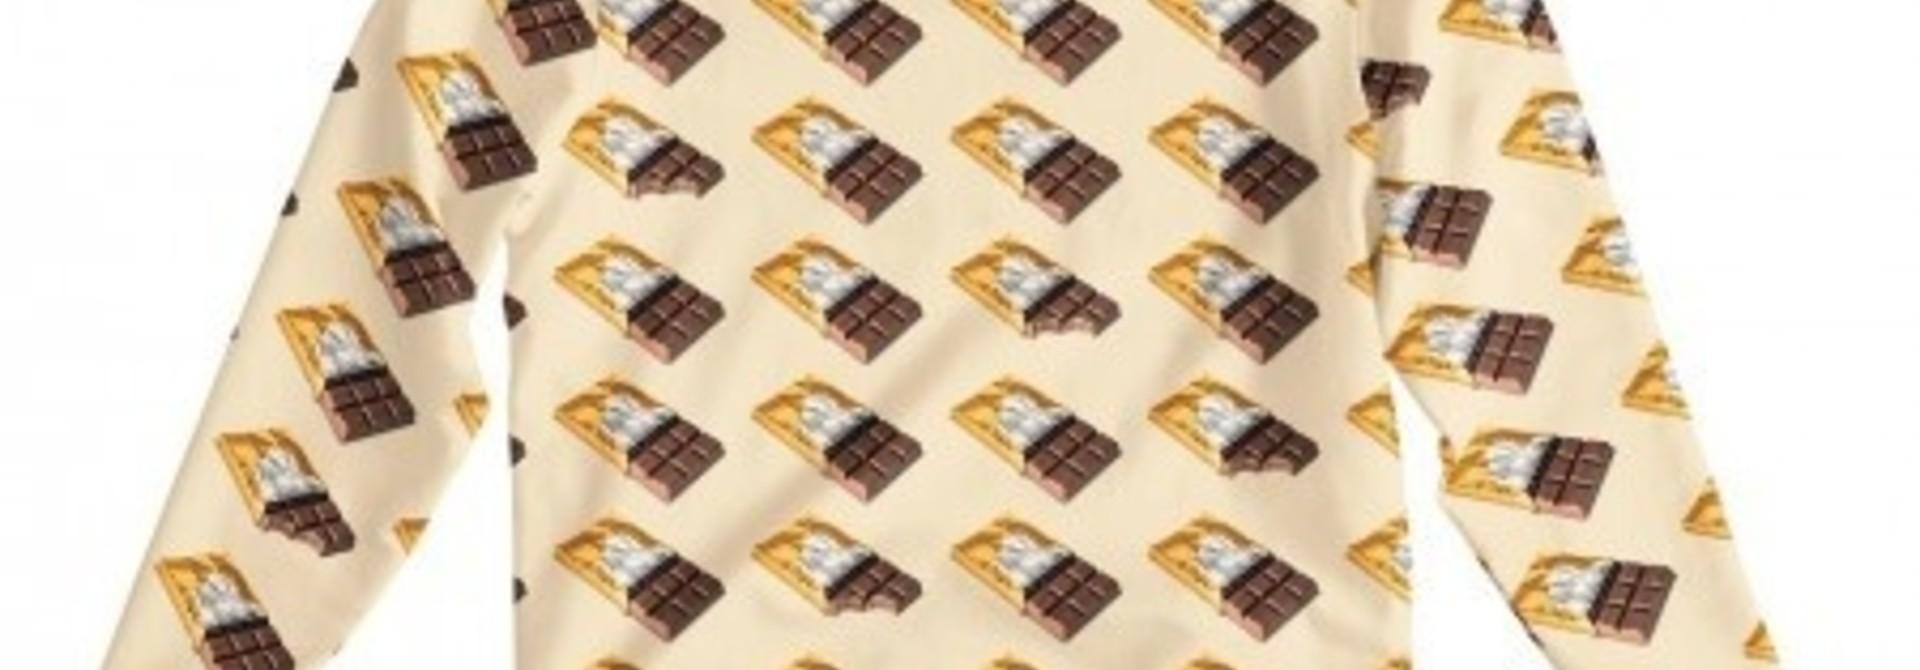 Top - L/S - Men's - Choco - Xsmall